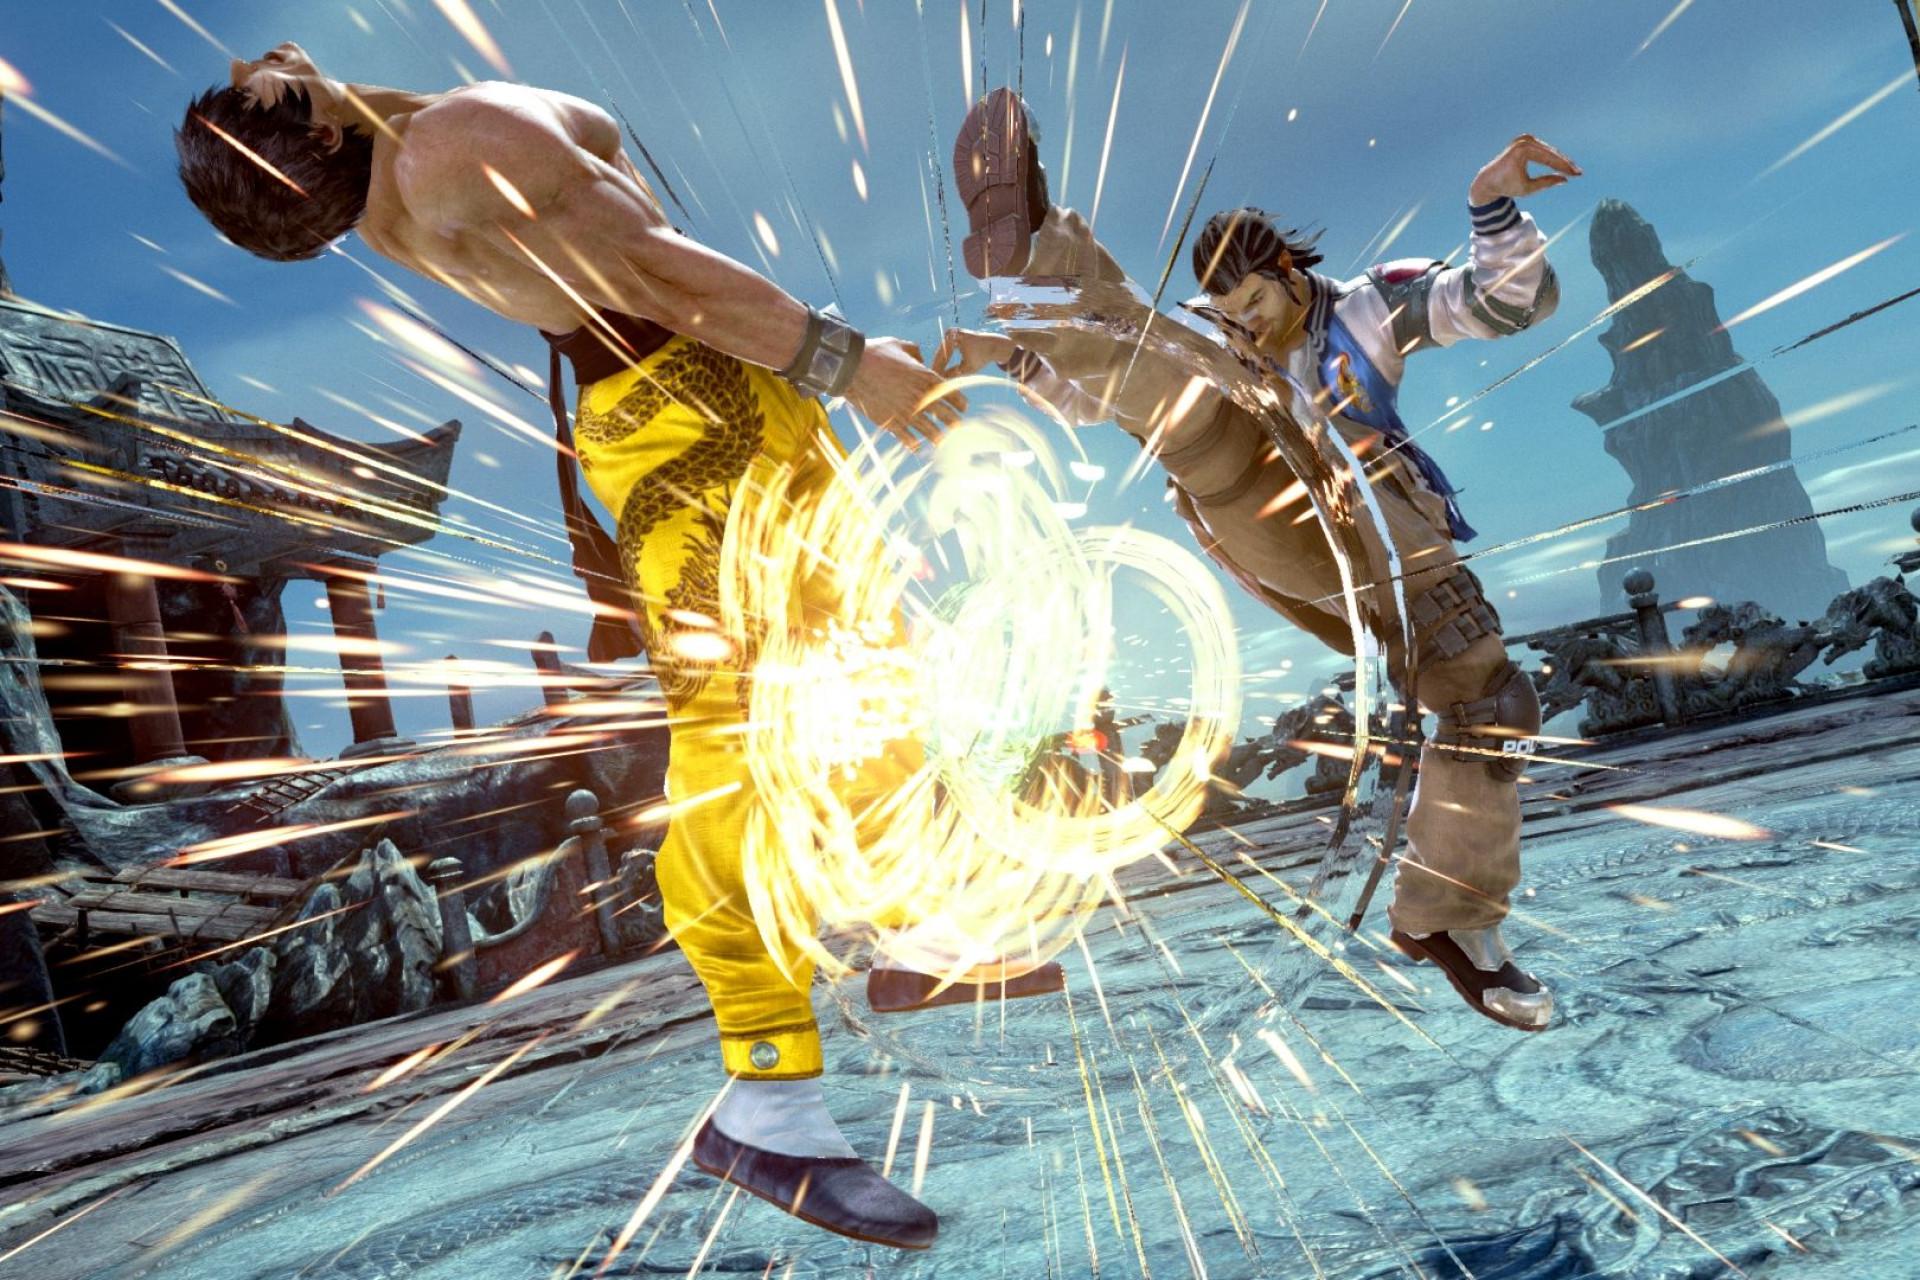 Negan de 'Walking Dead' está a caminho de 'Tekken 7'